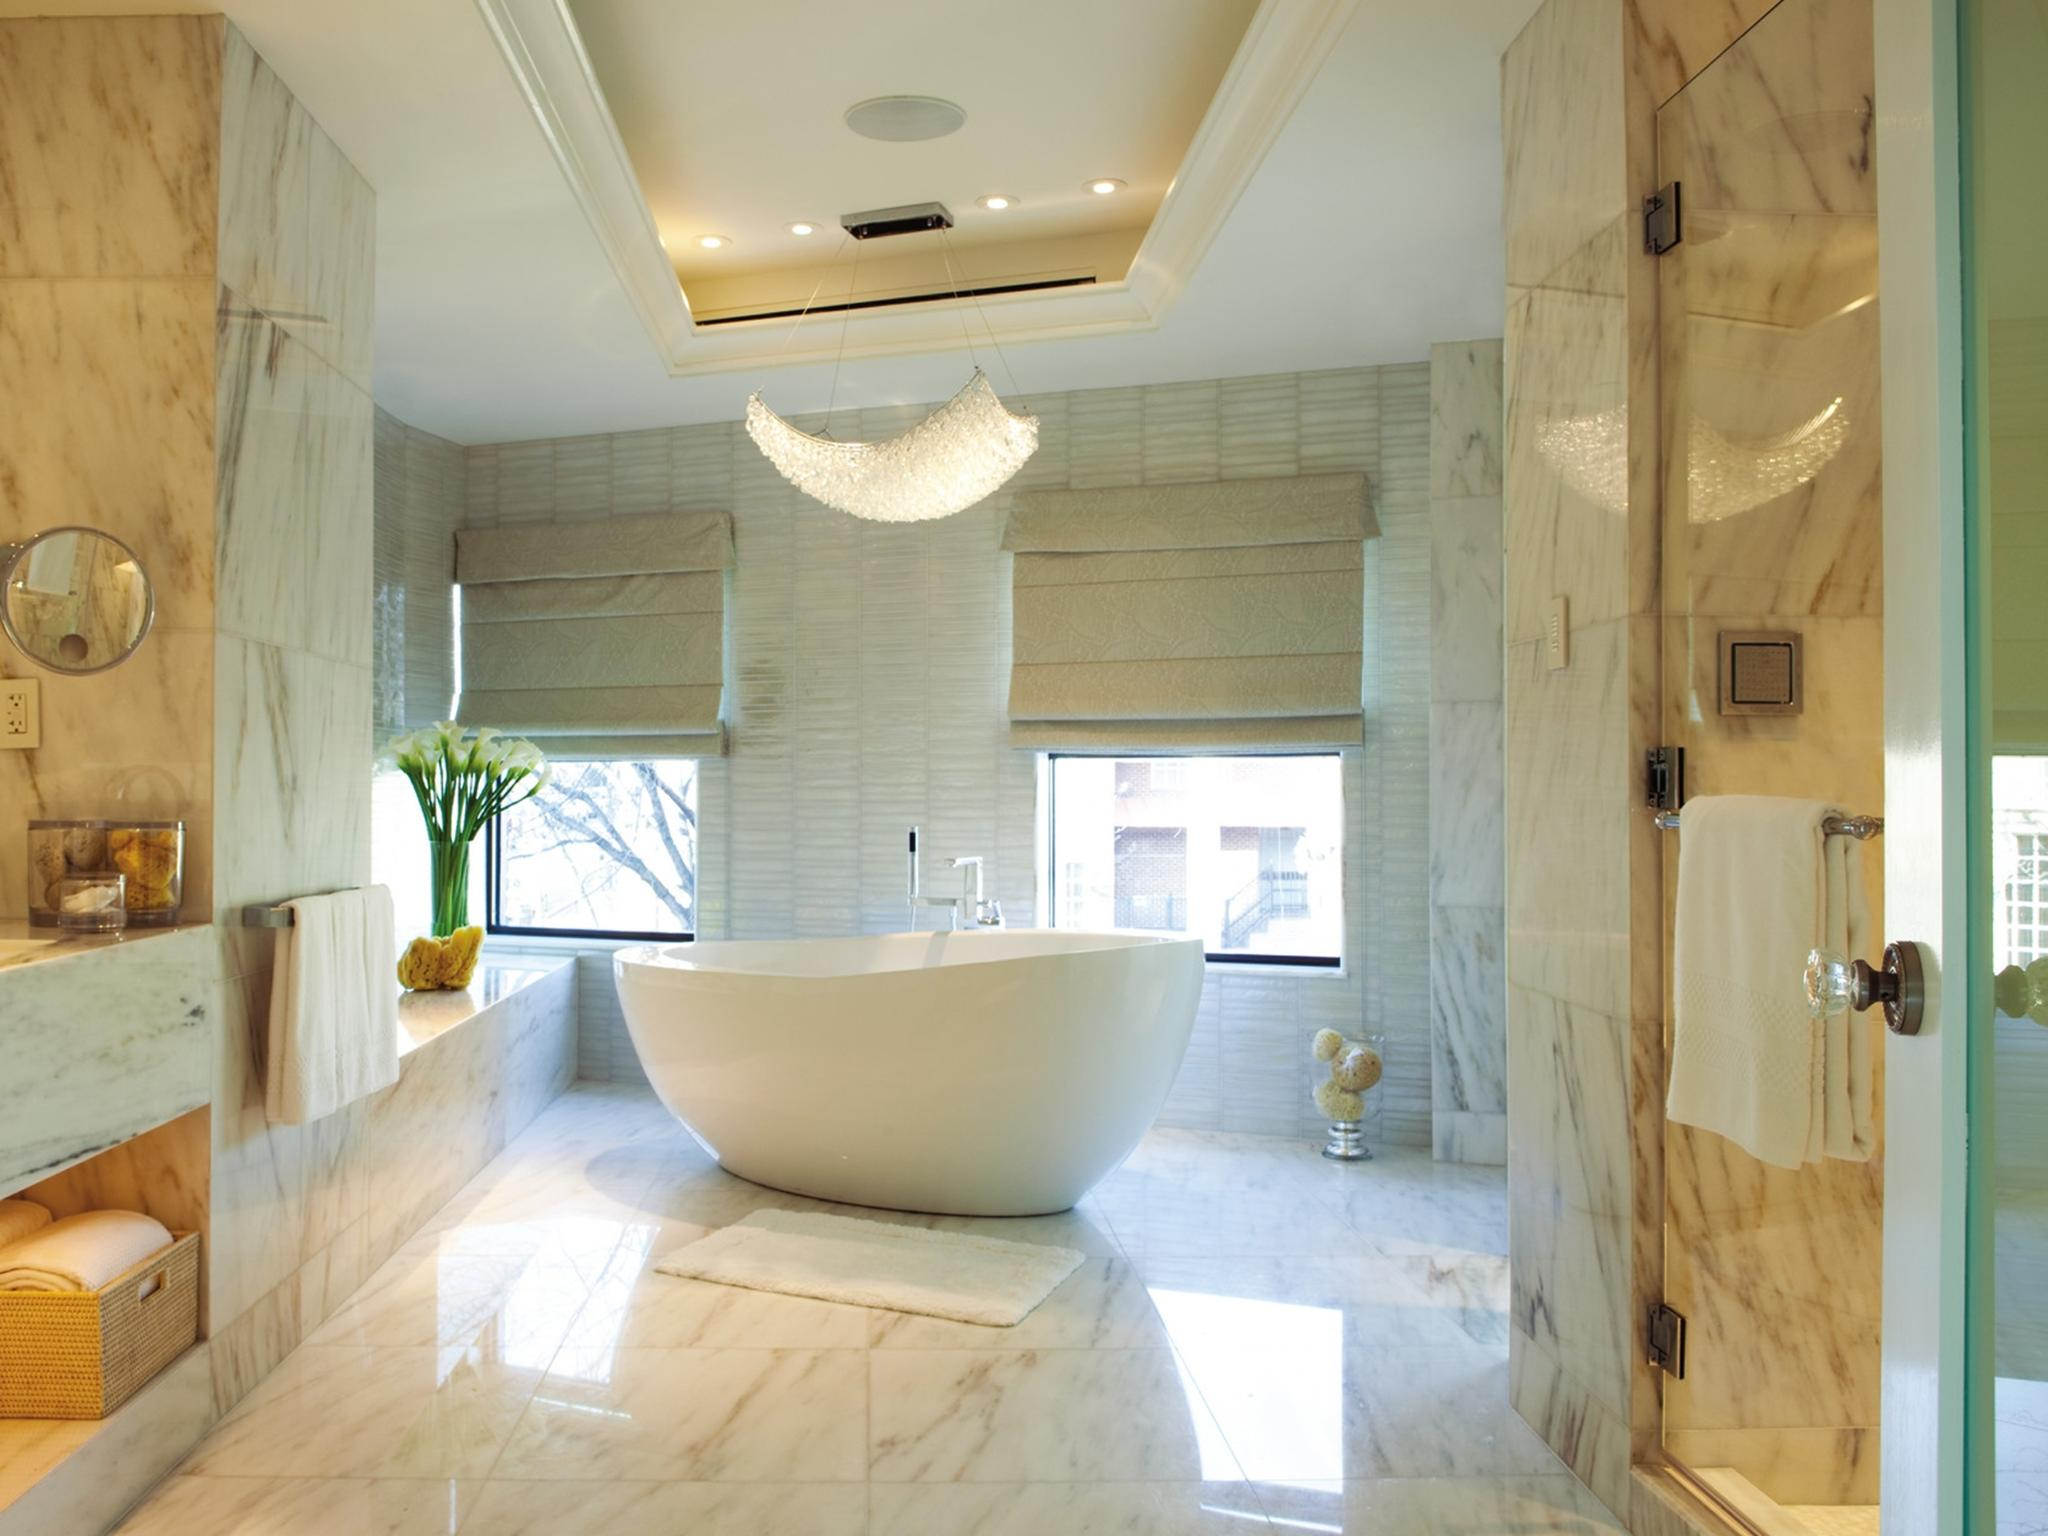 luxury baths | Apartments i Like blog